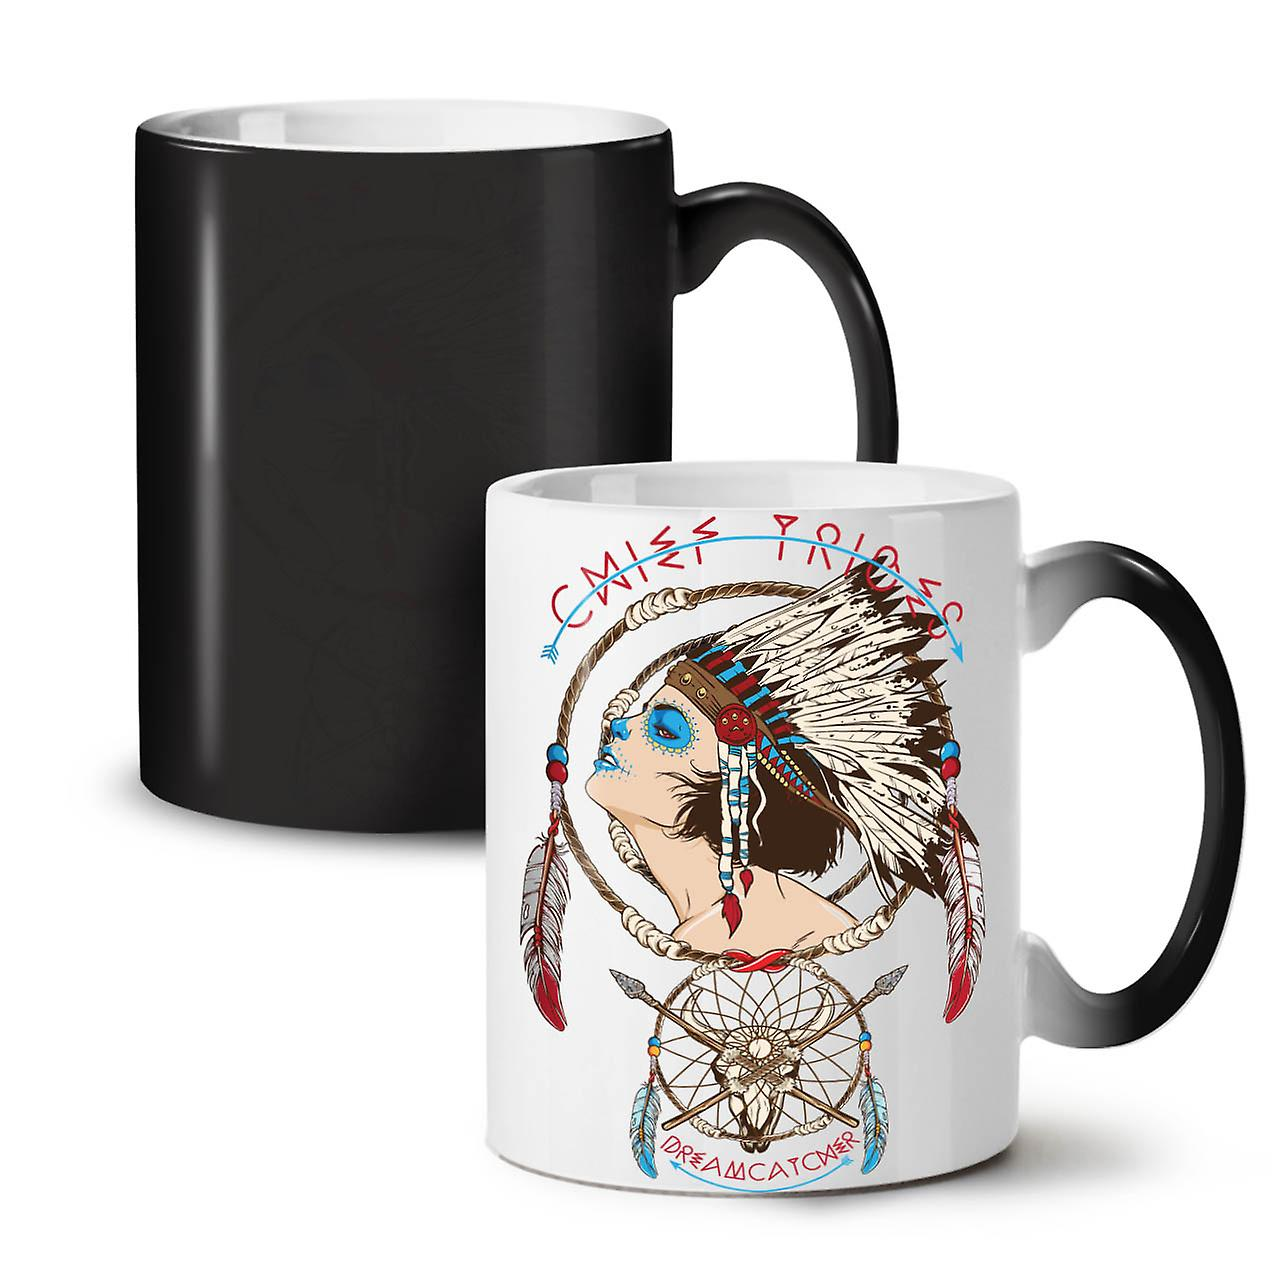 Chief Girl Art Fashion NEW Black Colour Changing Tea Coffee Ceramic Mug 11 oz | Wellcoda